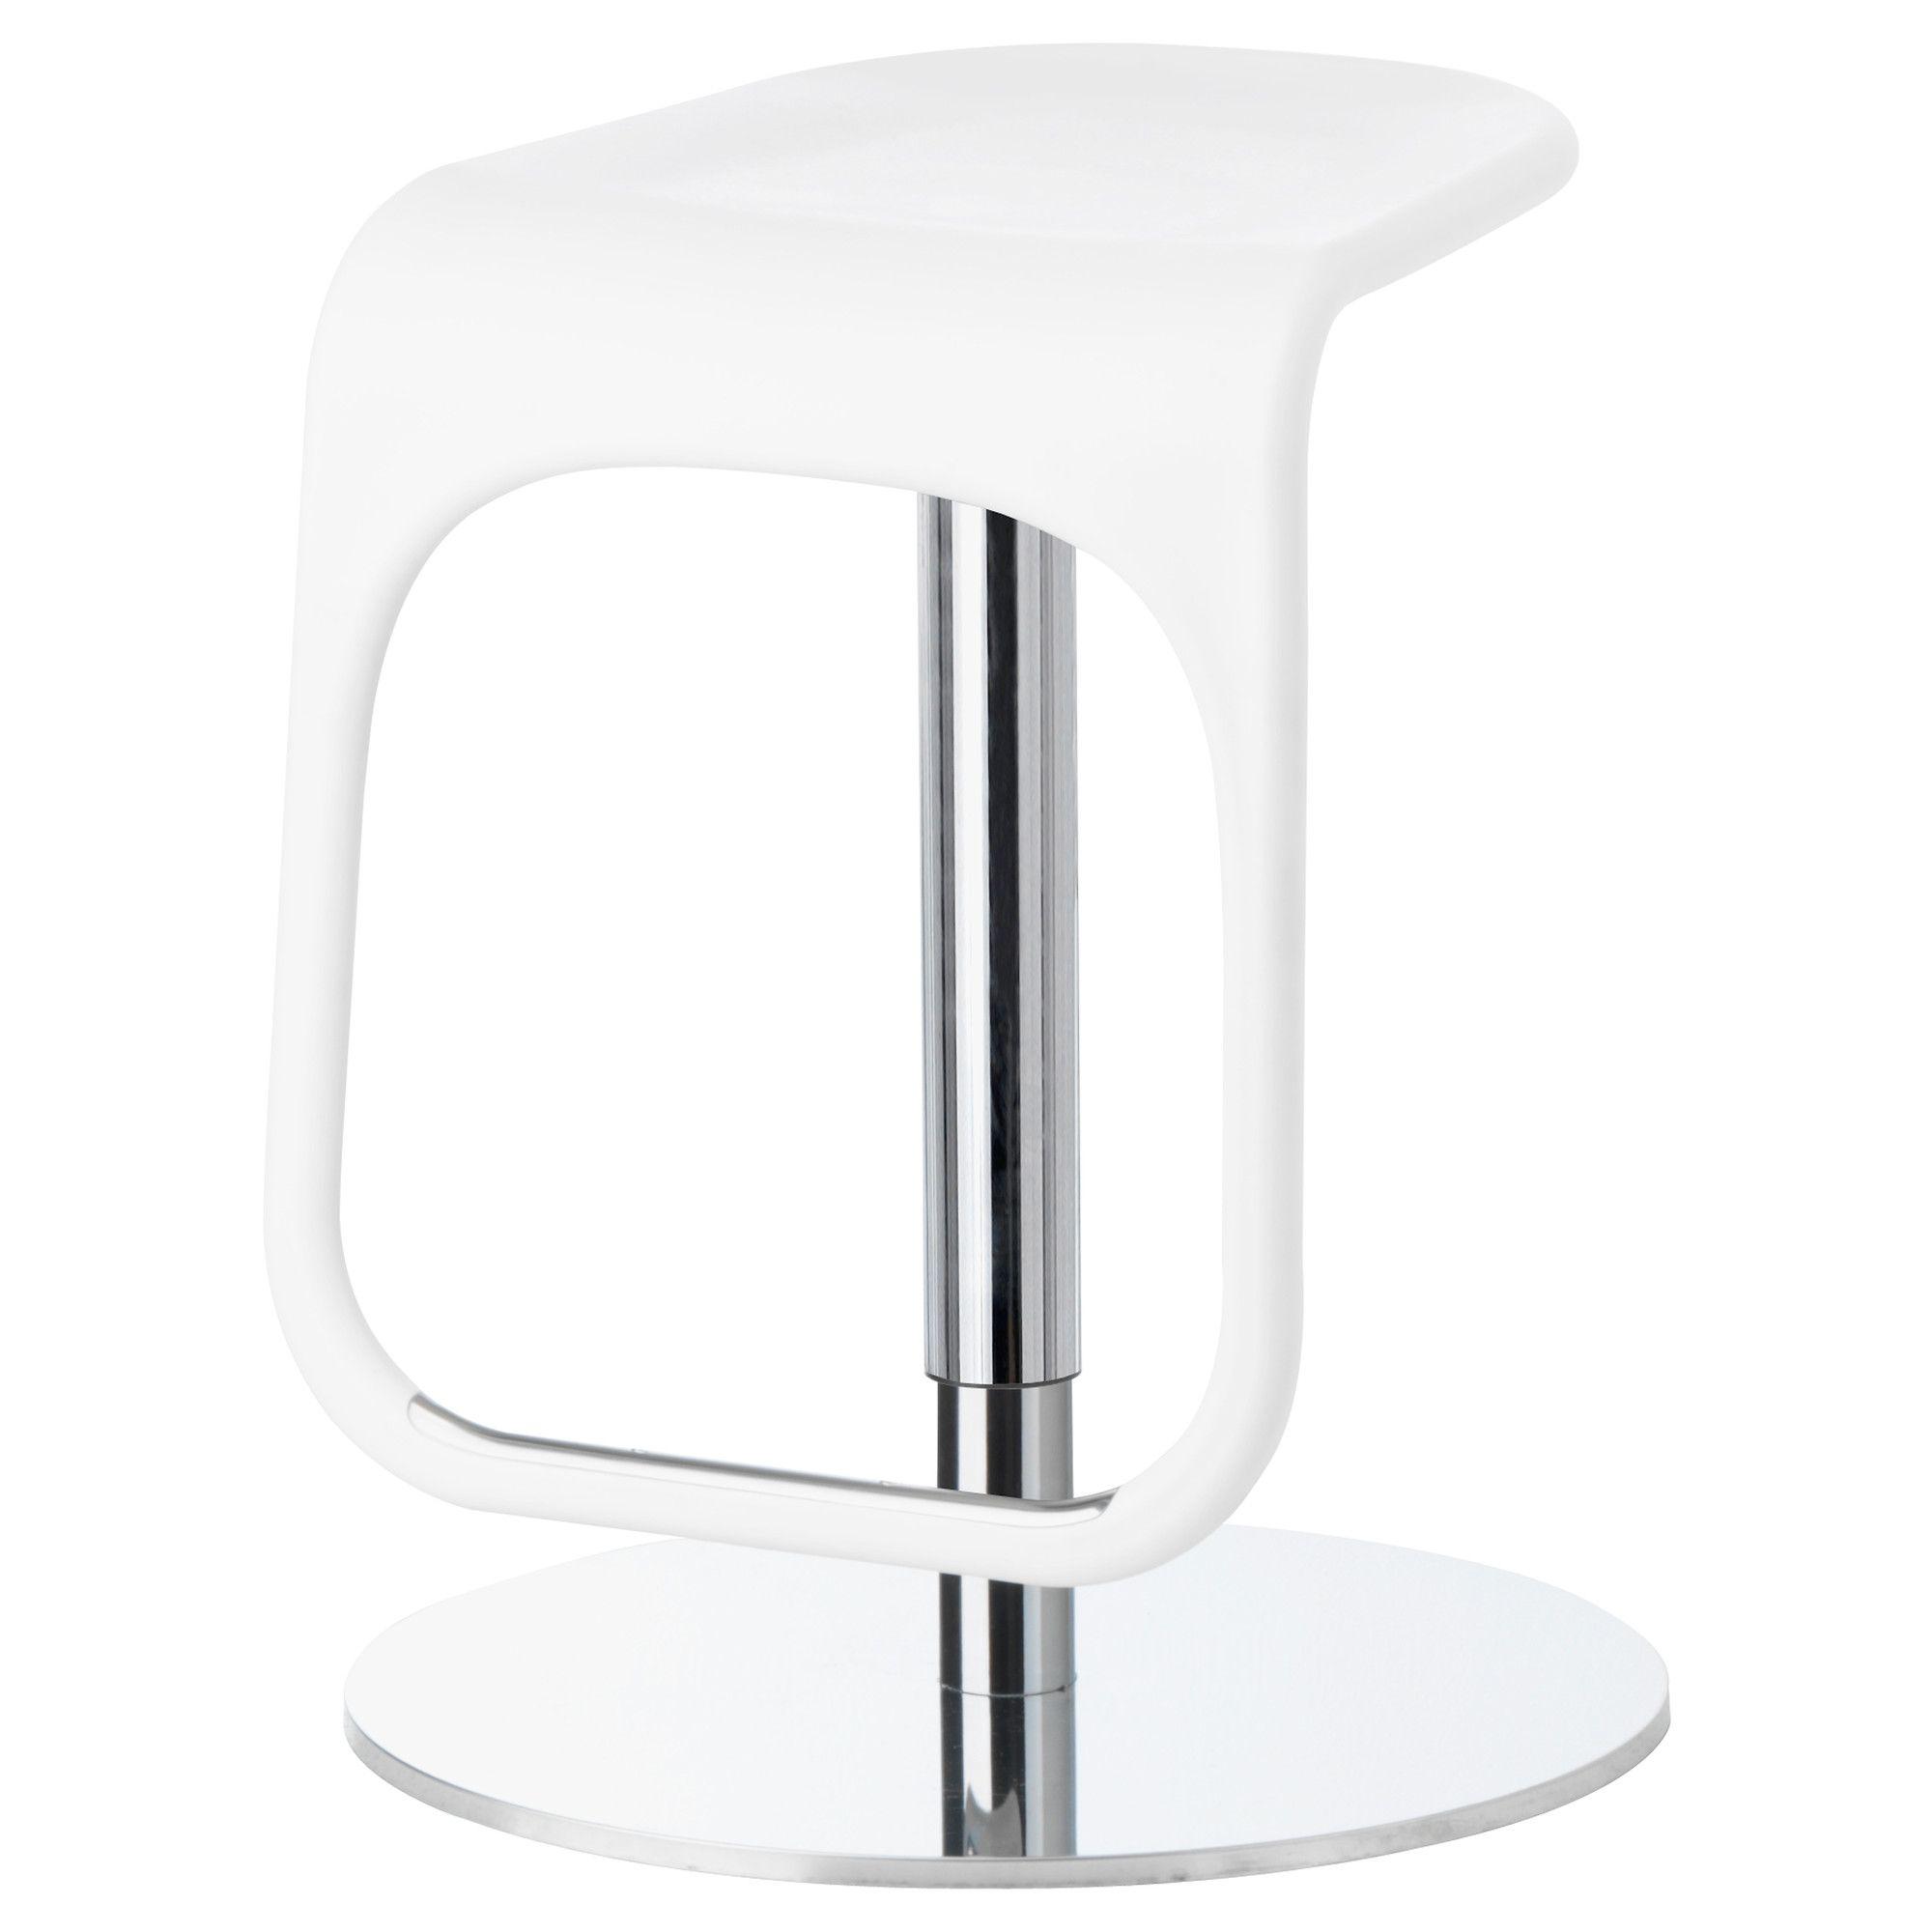 URBAN Bar stool IKEA So fortable Tried them yesterday